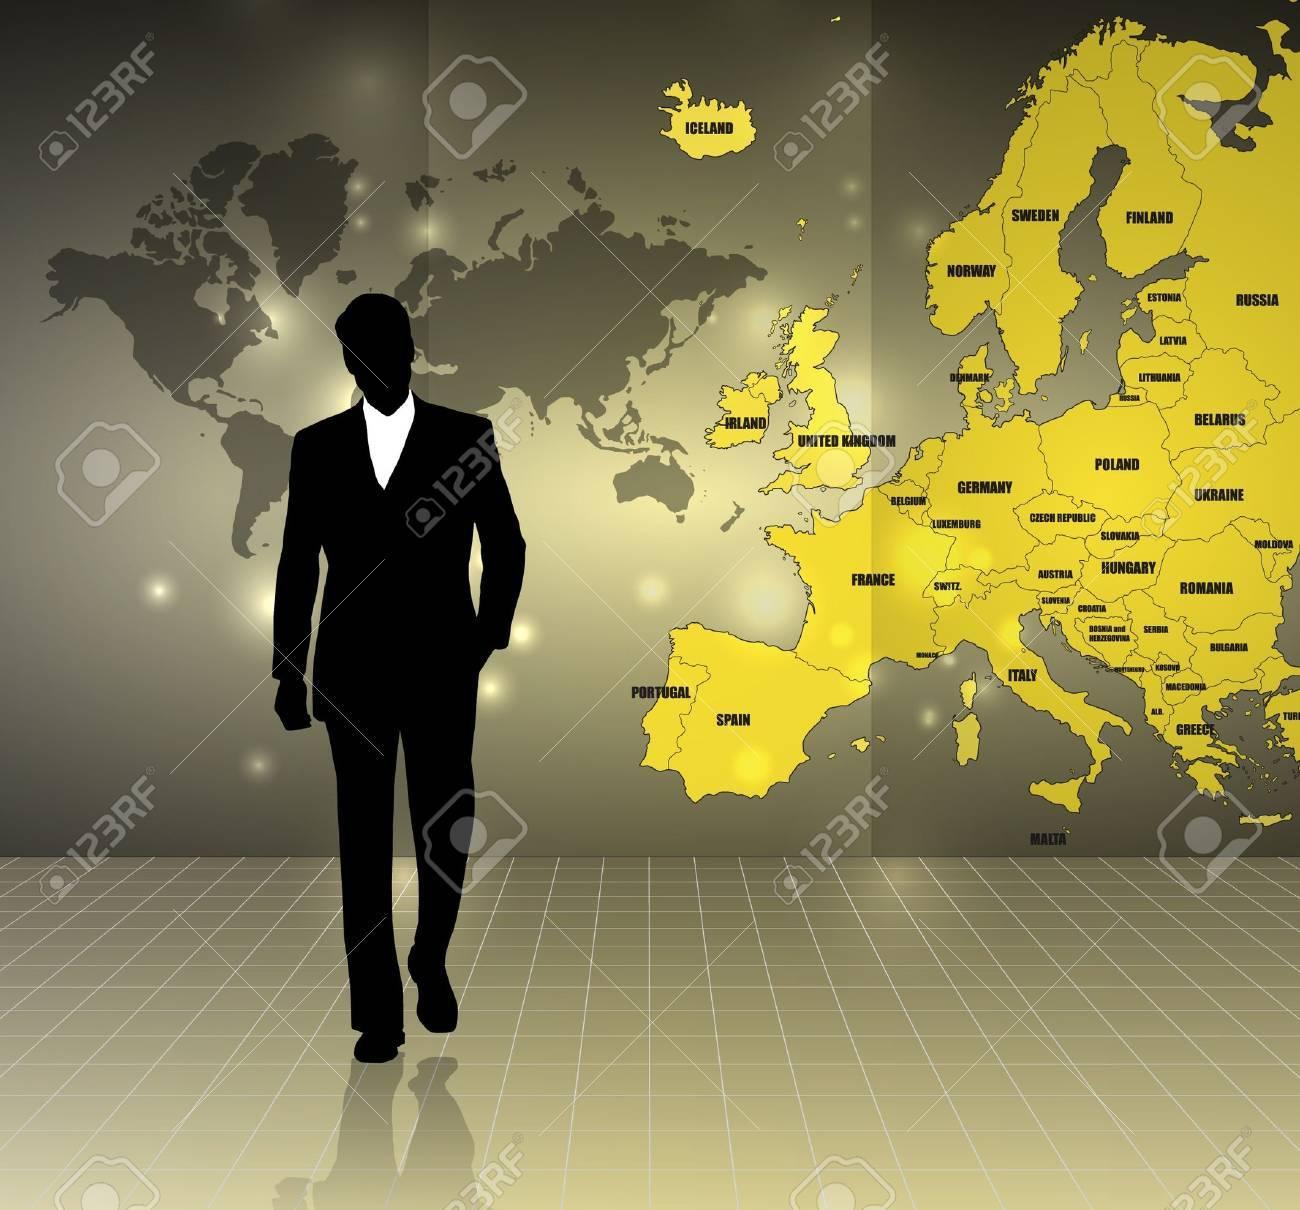 Business illustration Stock Vector - 13027872